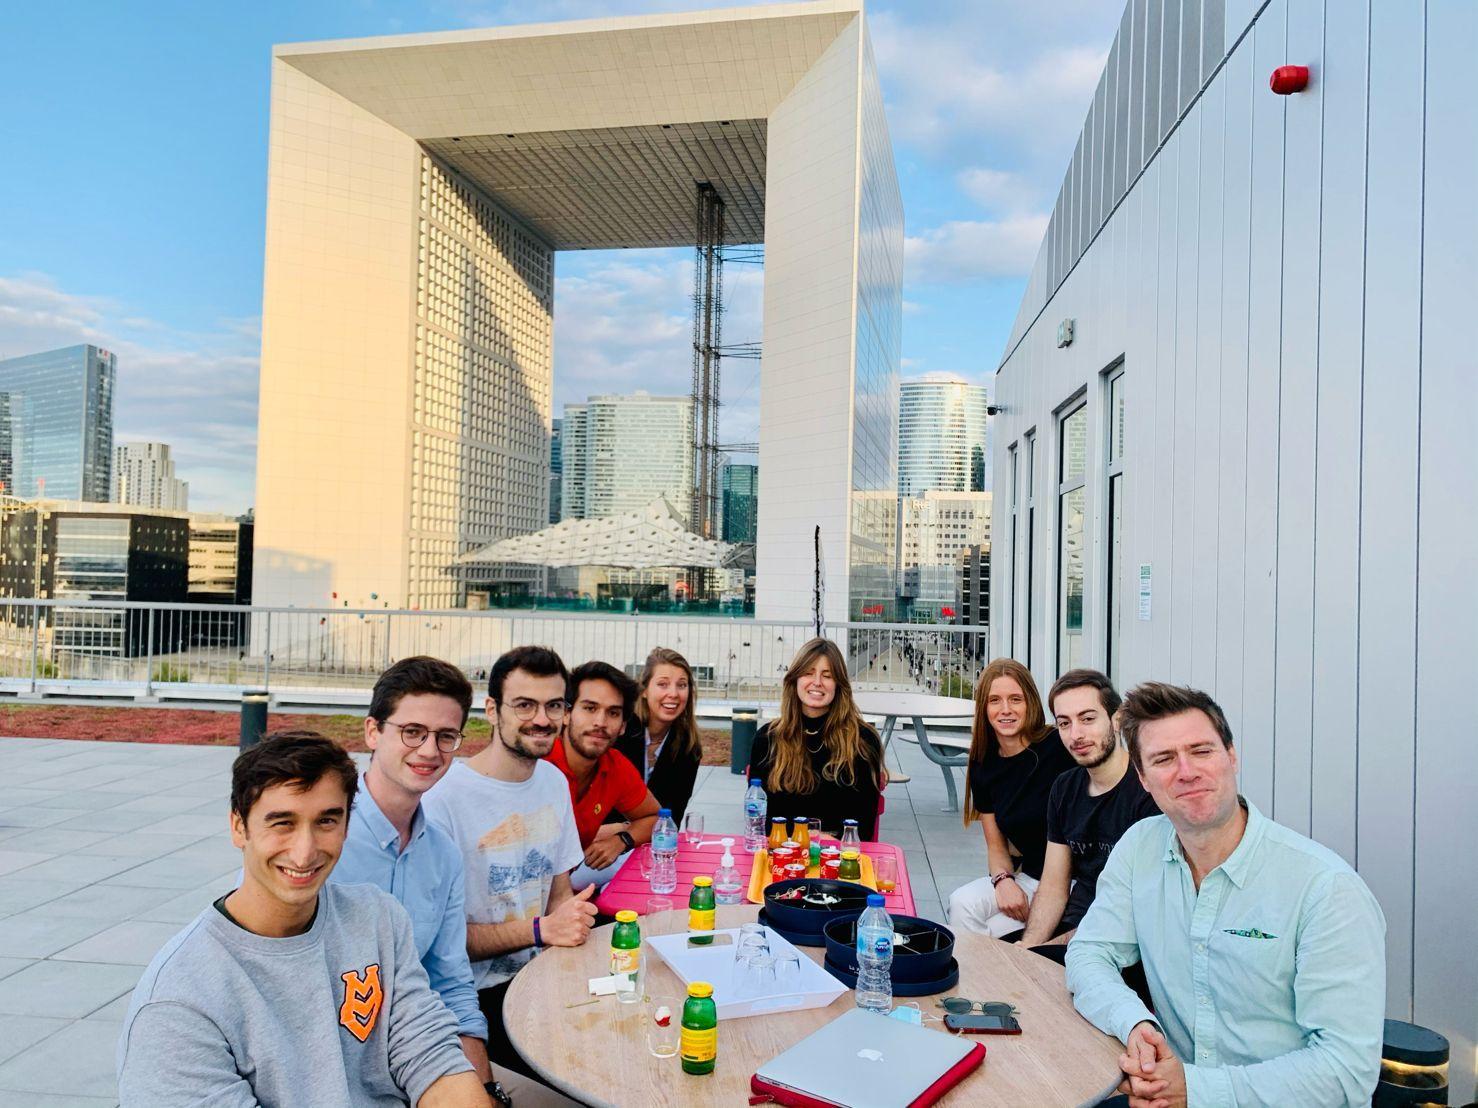 MSc Entrepreneurship and Innovation: A collaboration between IESEG Paris, IIM and IIE